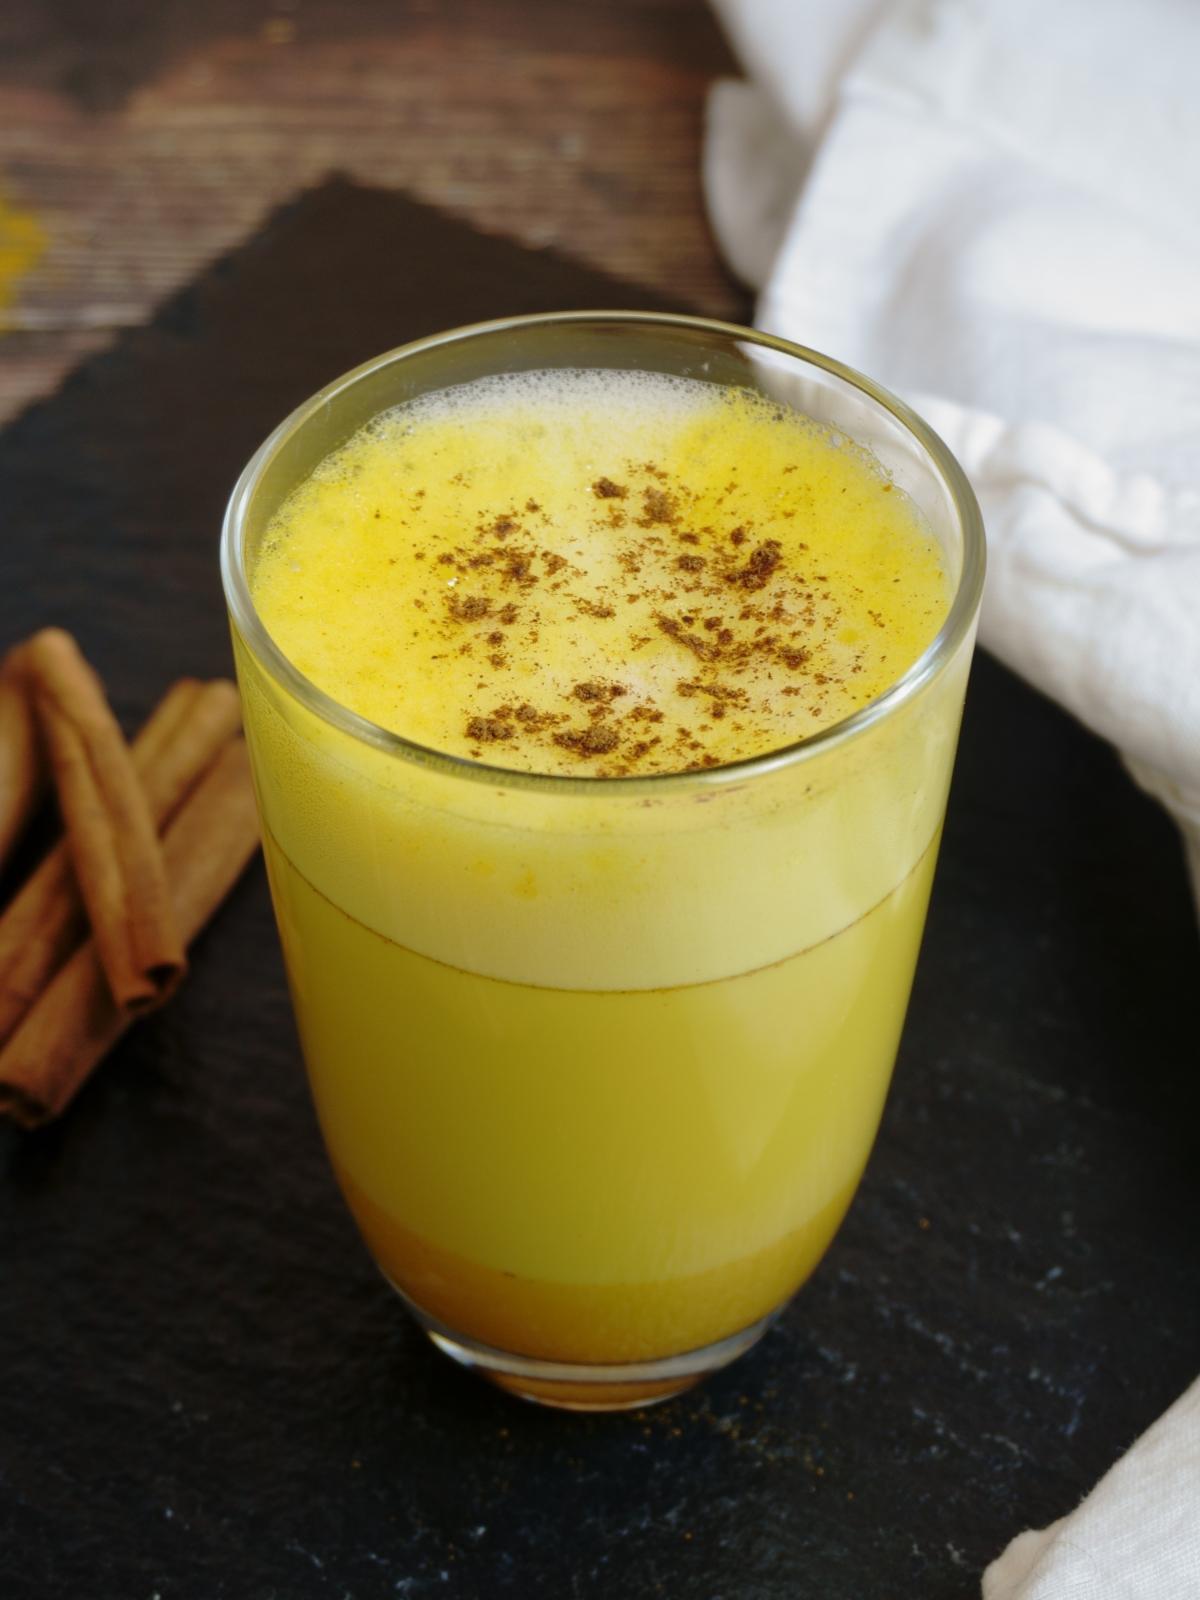 Turmeric Latte or Golden Milk Front Shot